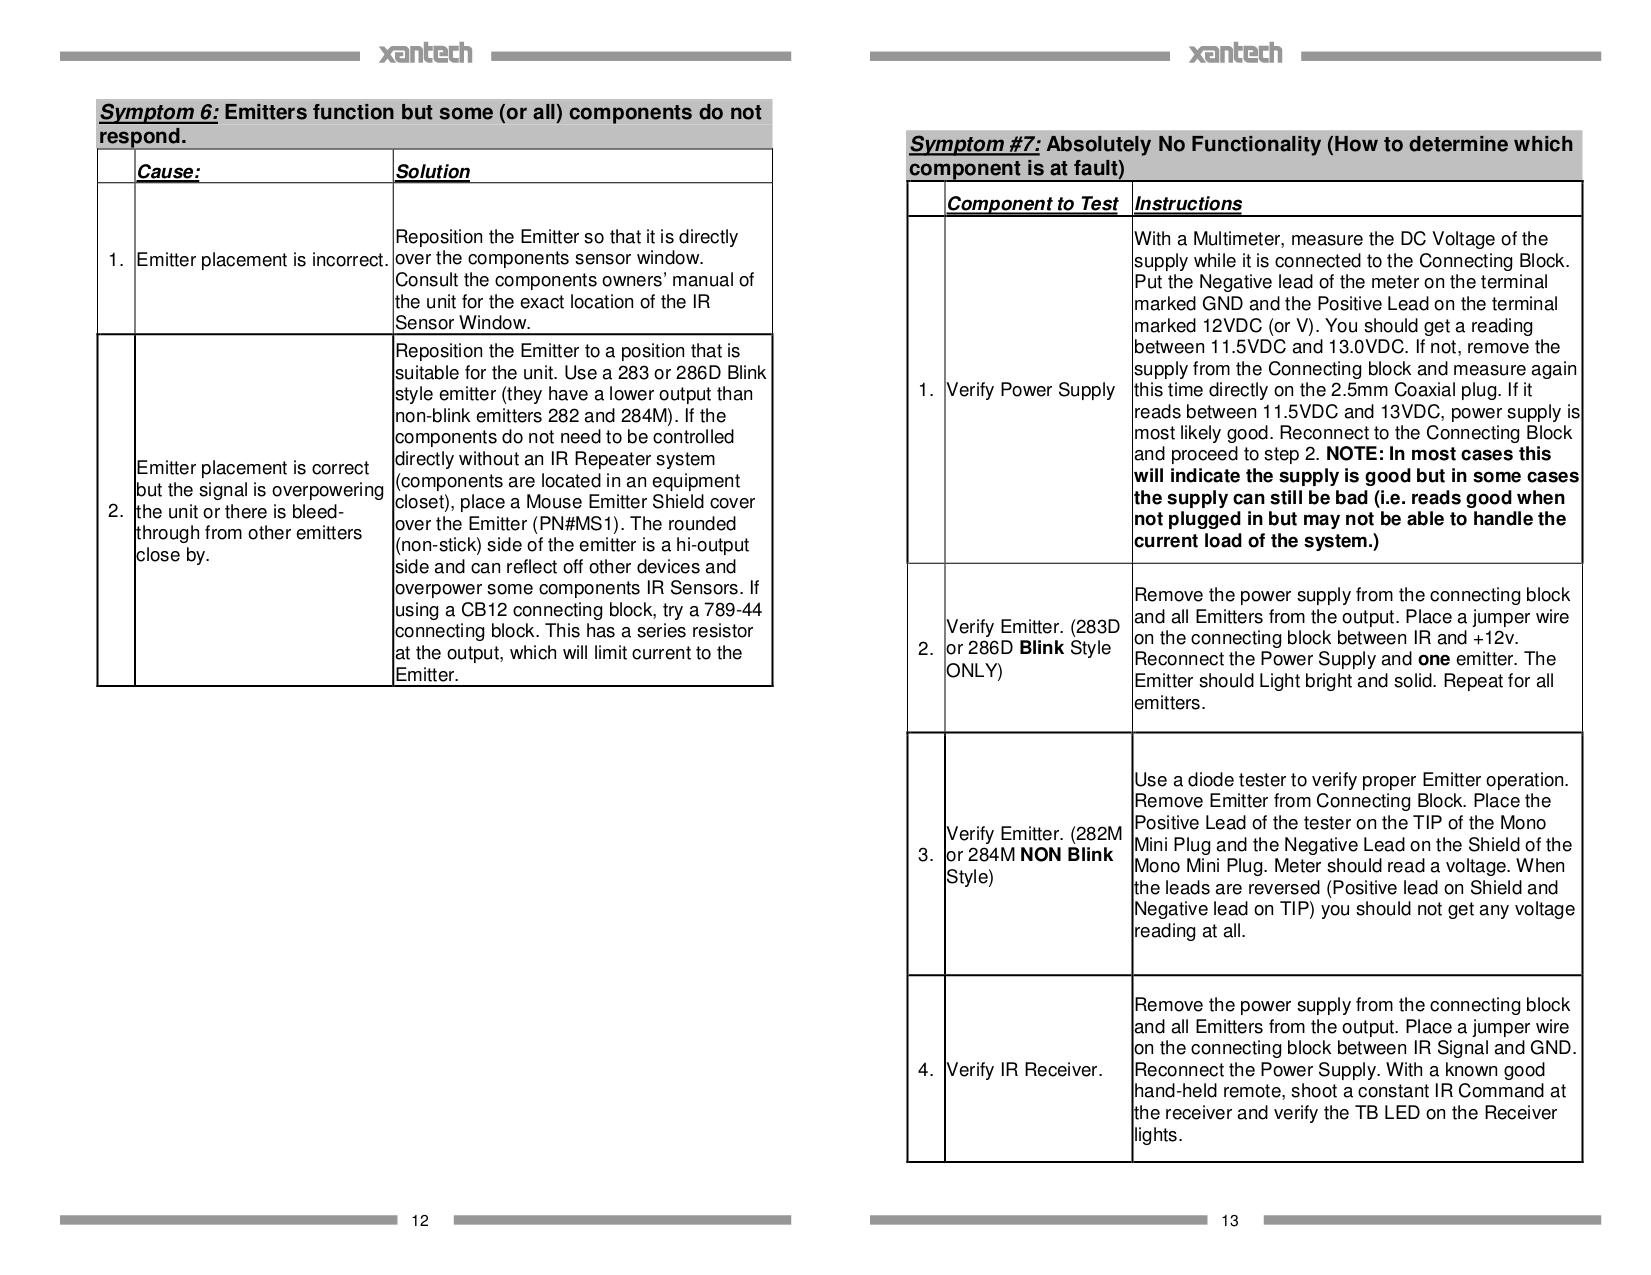 Xantech Ir Receiver Wiring Diagram Detailed Schematics Speakercraft Dl85k Kit Harman Kardon Famous